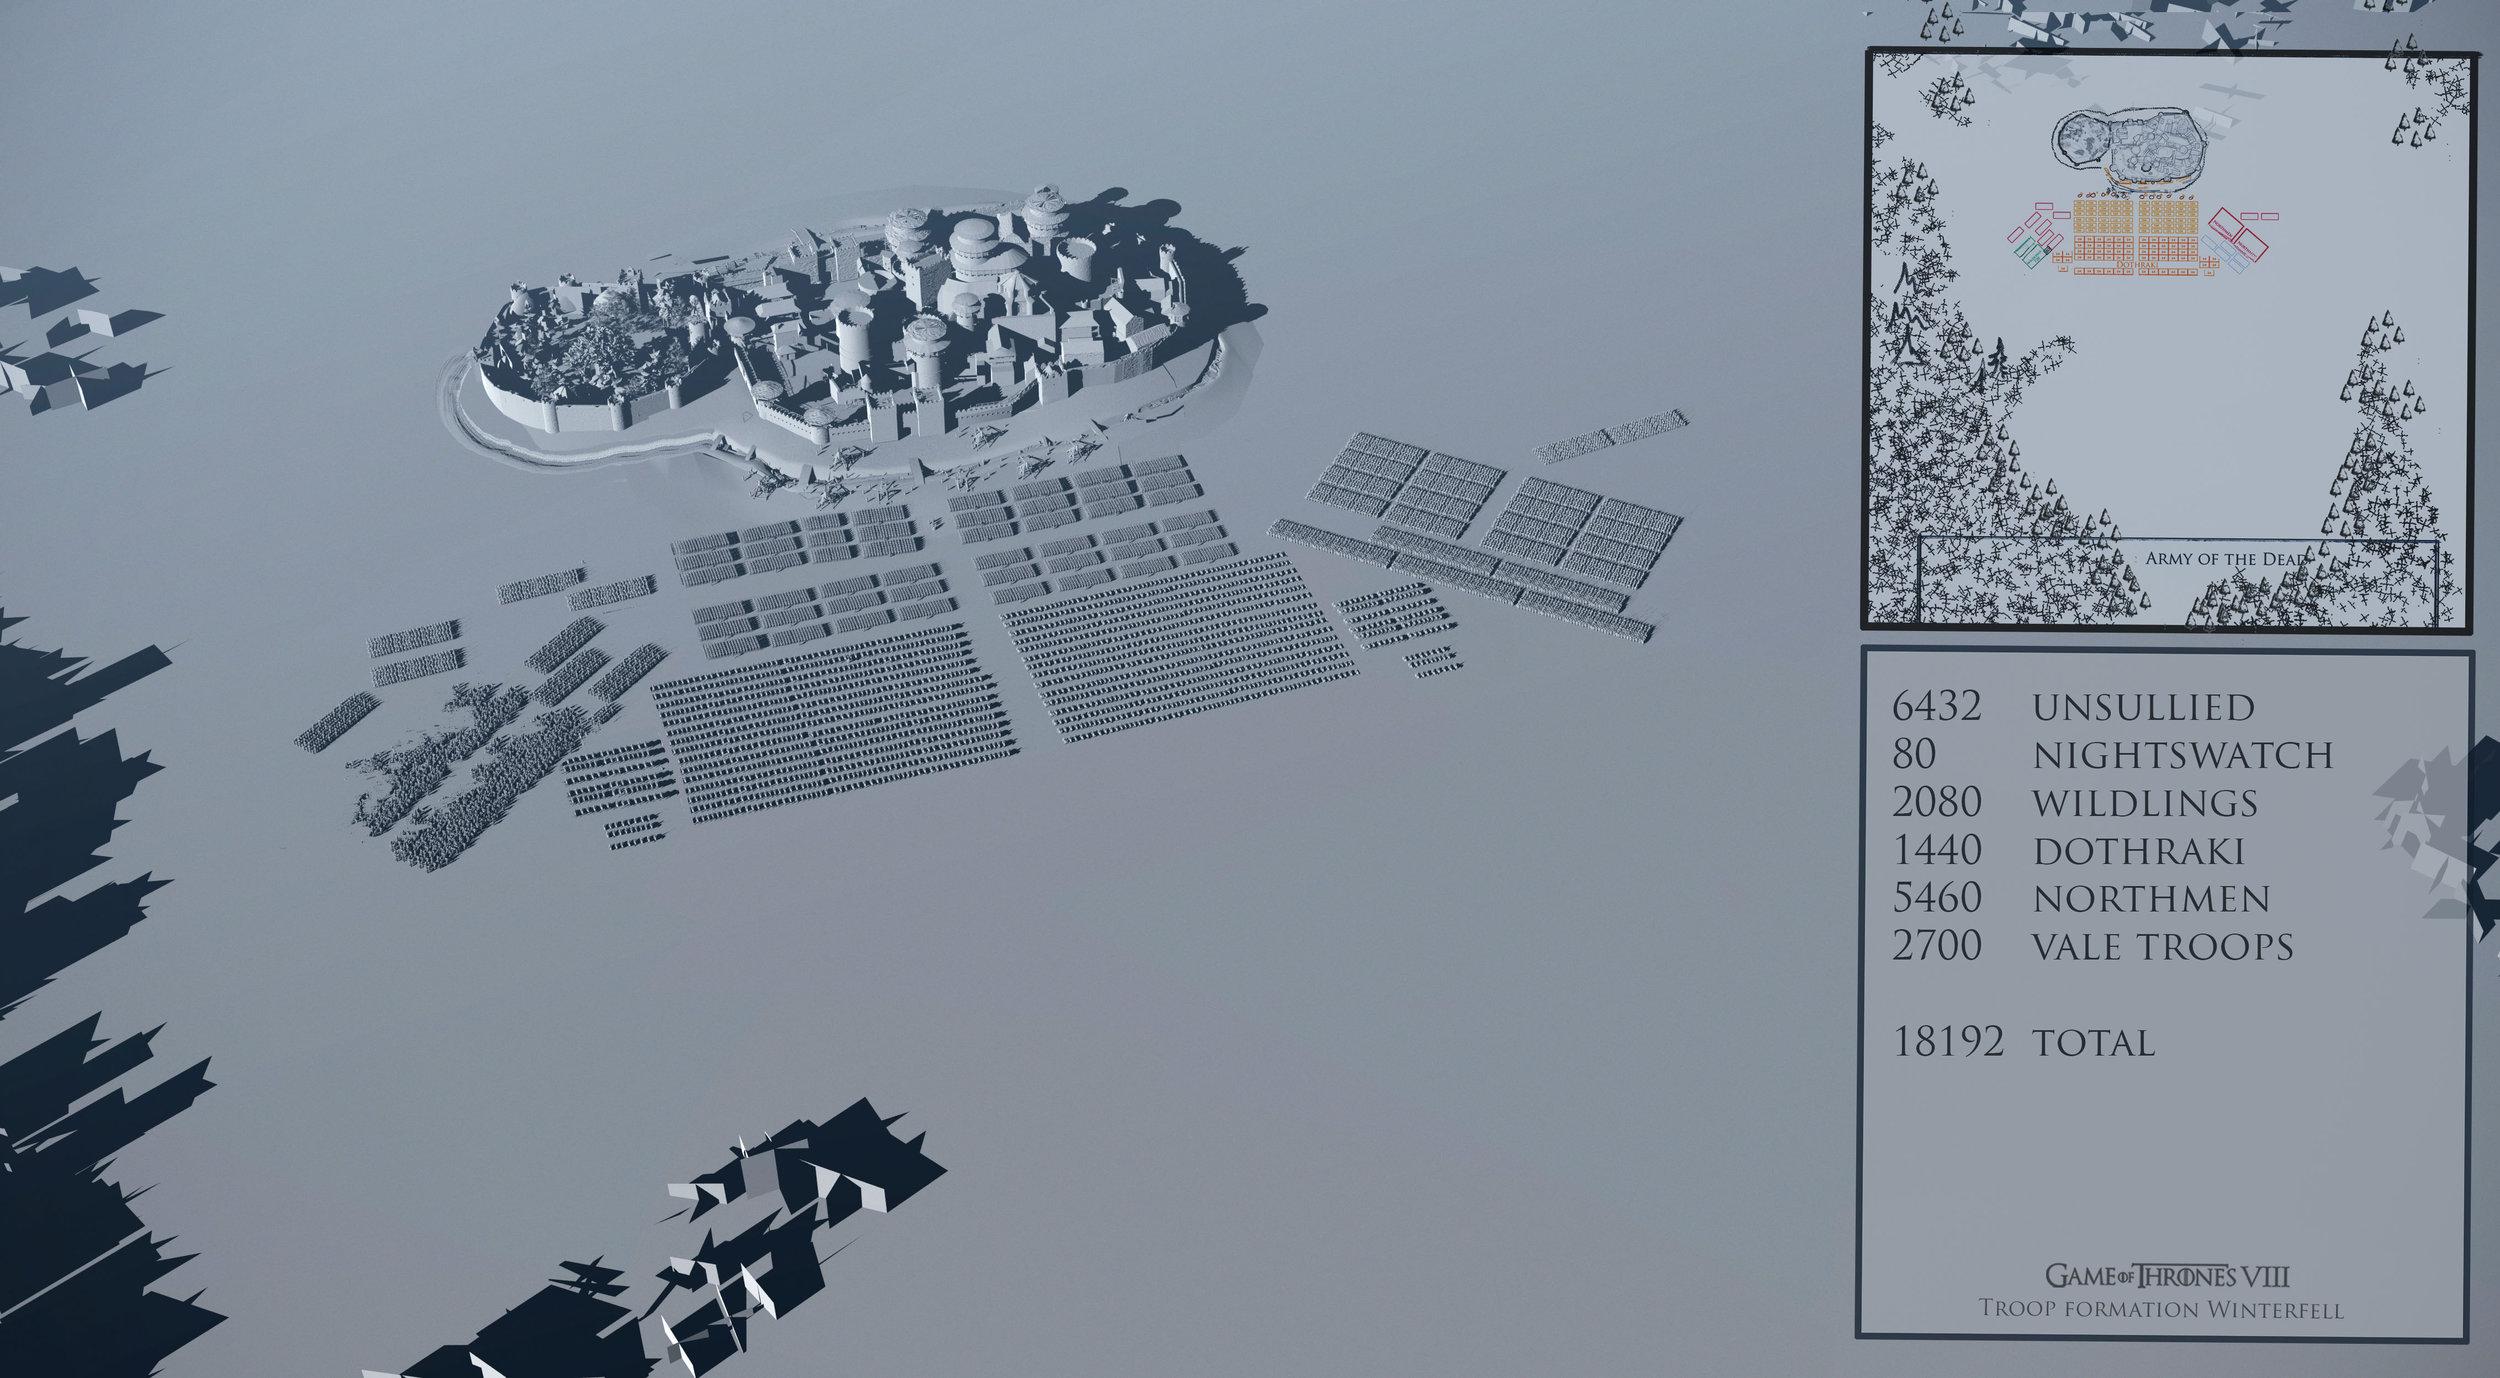 Winterfell_Gates_Formation_Total_troops._0032 copy.jpg